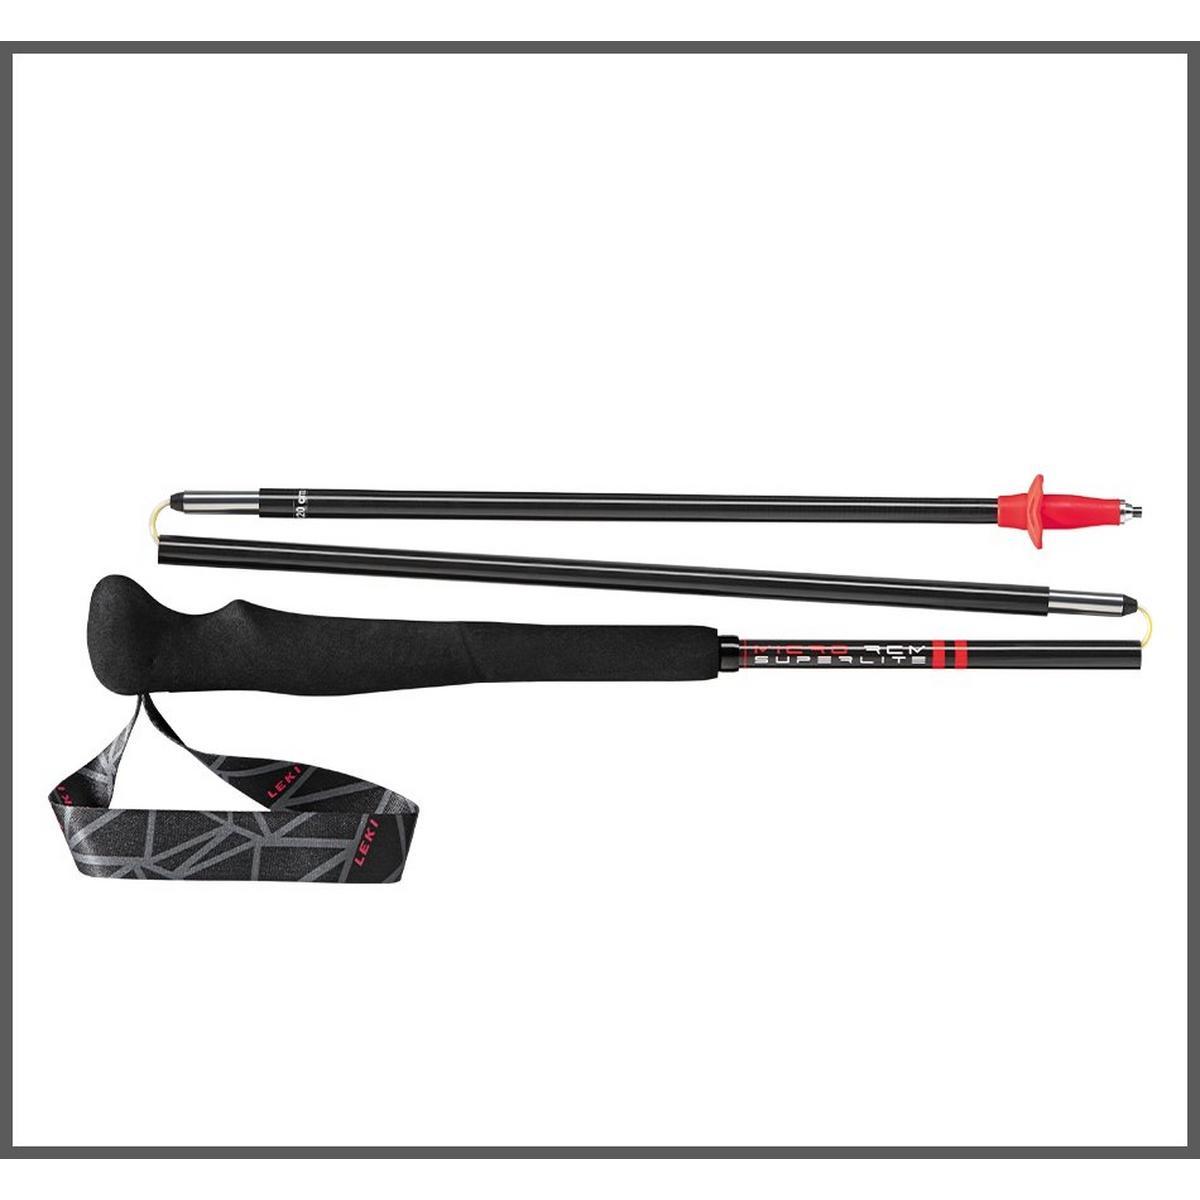 Leki Micro RCM Superlight Trail Running Poles - Red